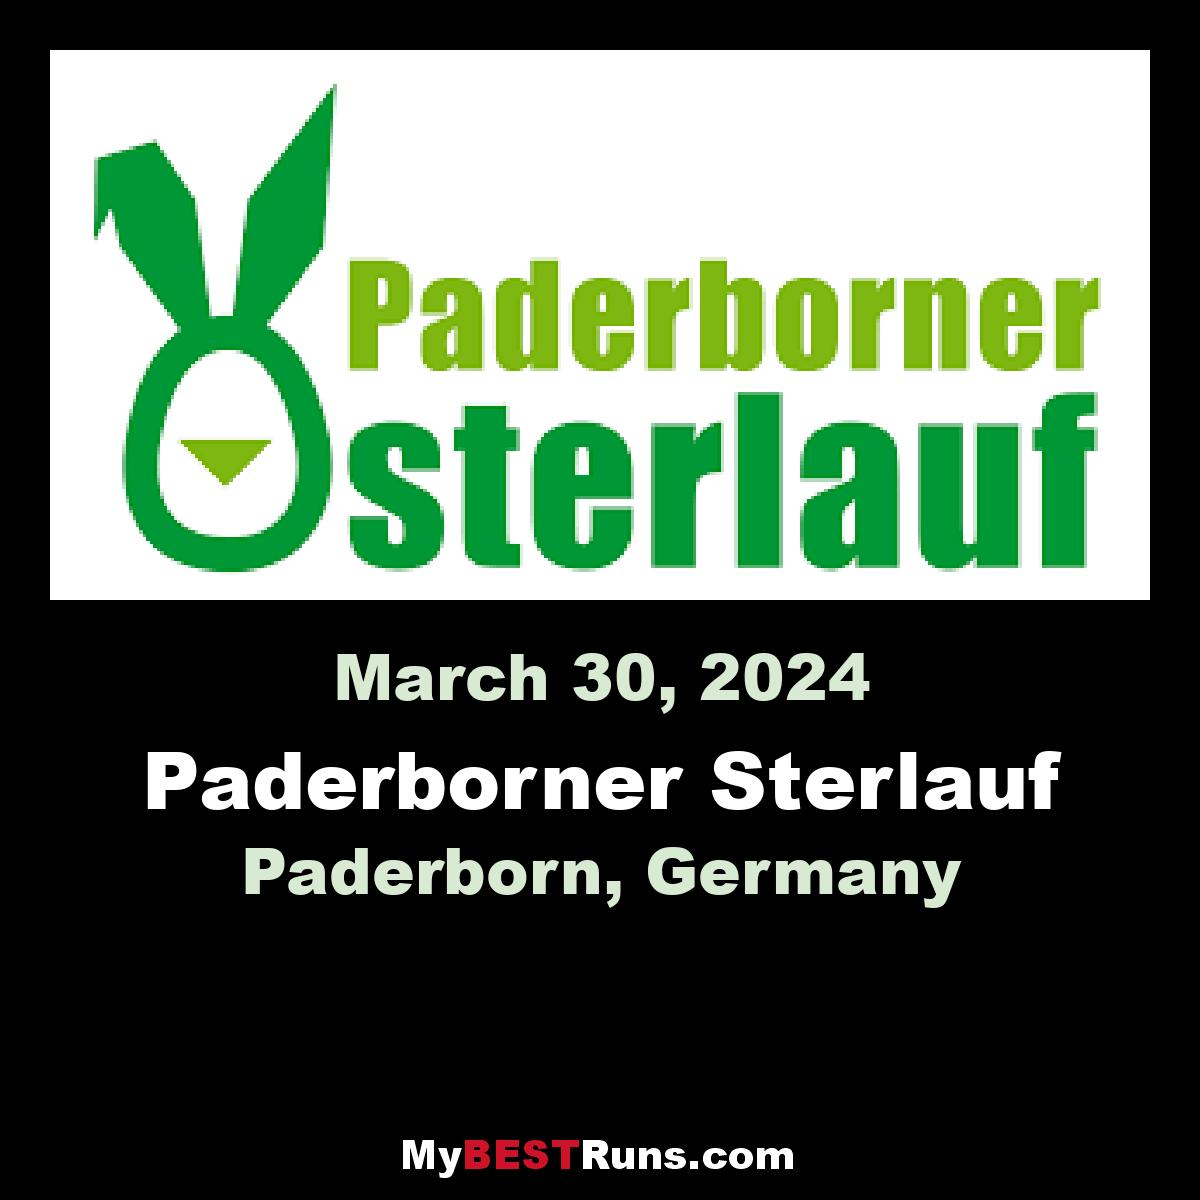 Paderborner Sterlauf